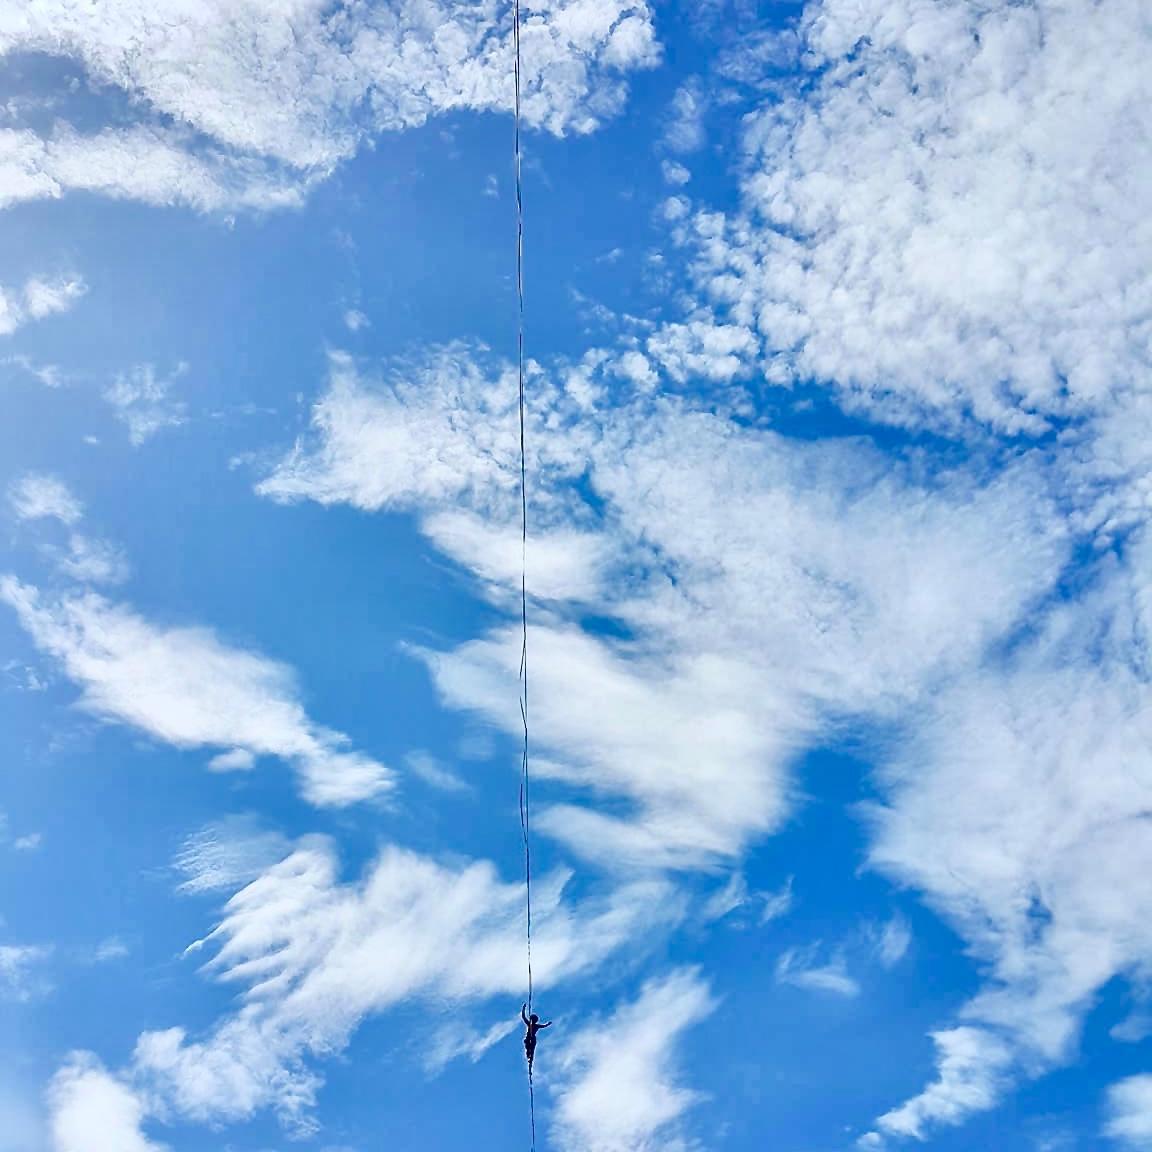 Highline slackline in the sky